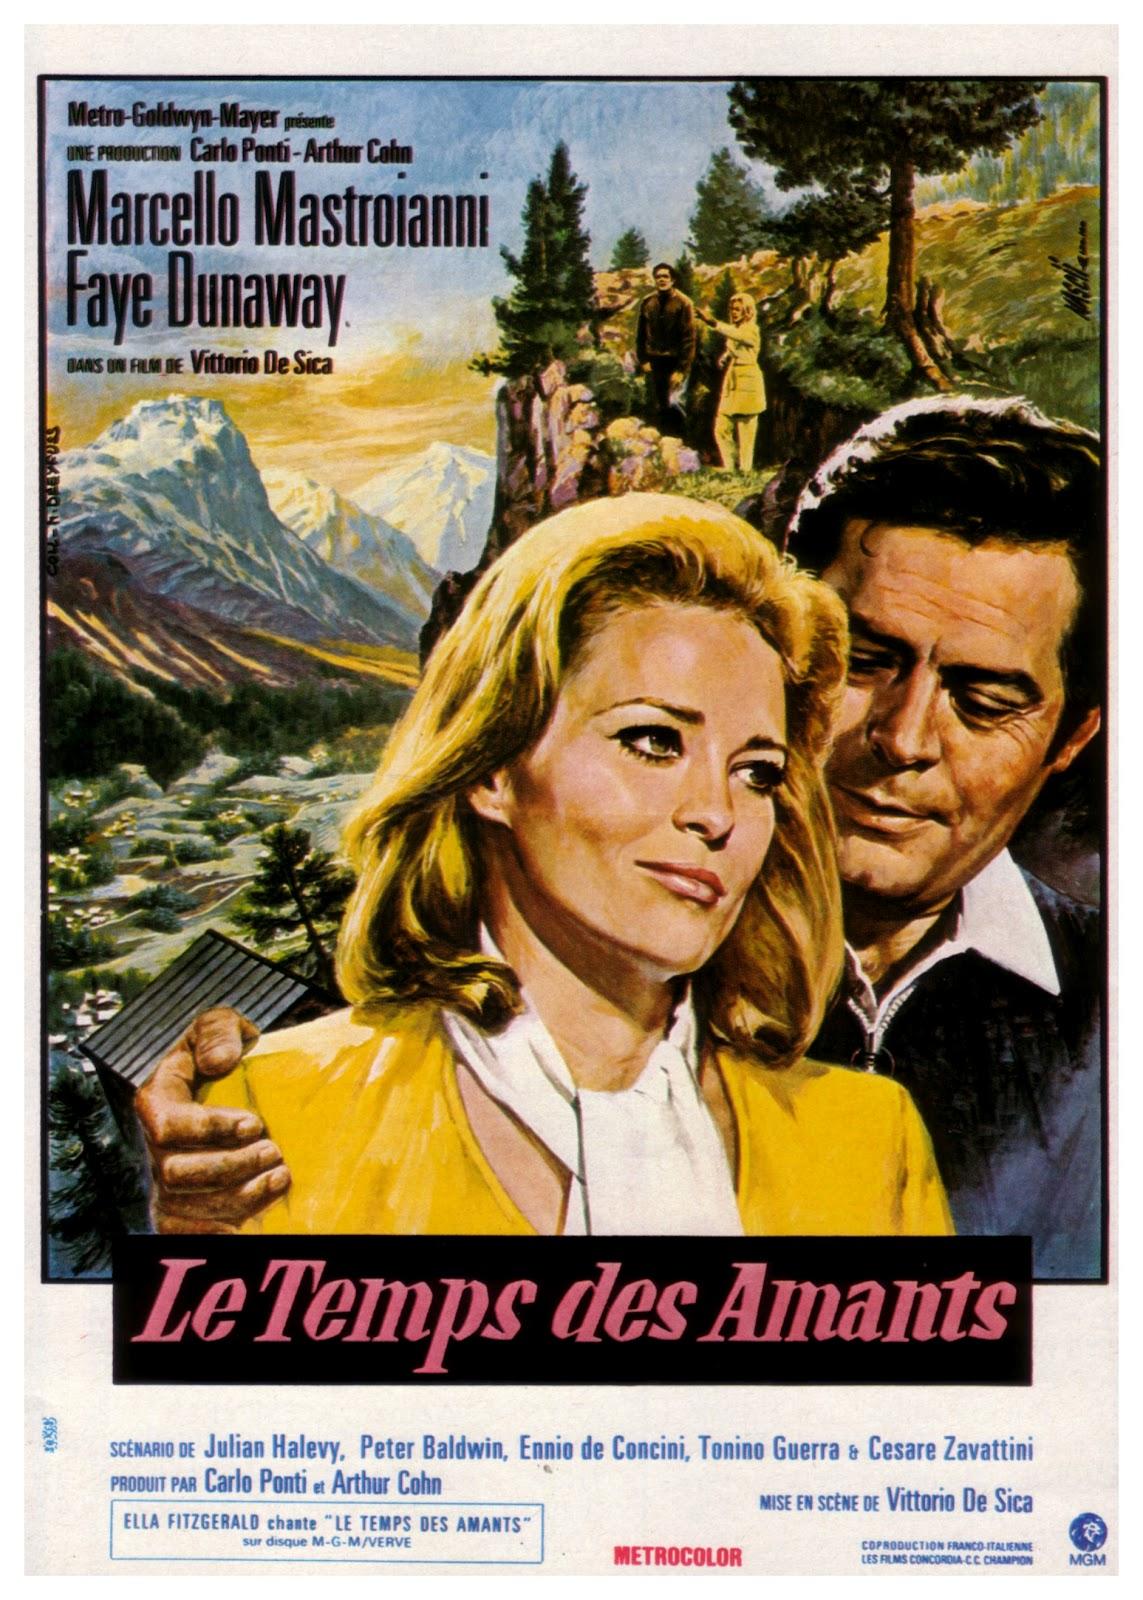 http://4.bp.blogspot.com/-Q7NanghAaKk/T3hMdaF9KRI/AAAAAAAADxc/r6vWo7z4u7I/s1600/Amanti+De+Sica+french+poster.jpg